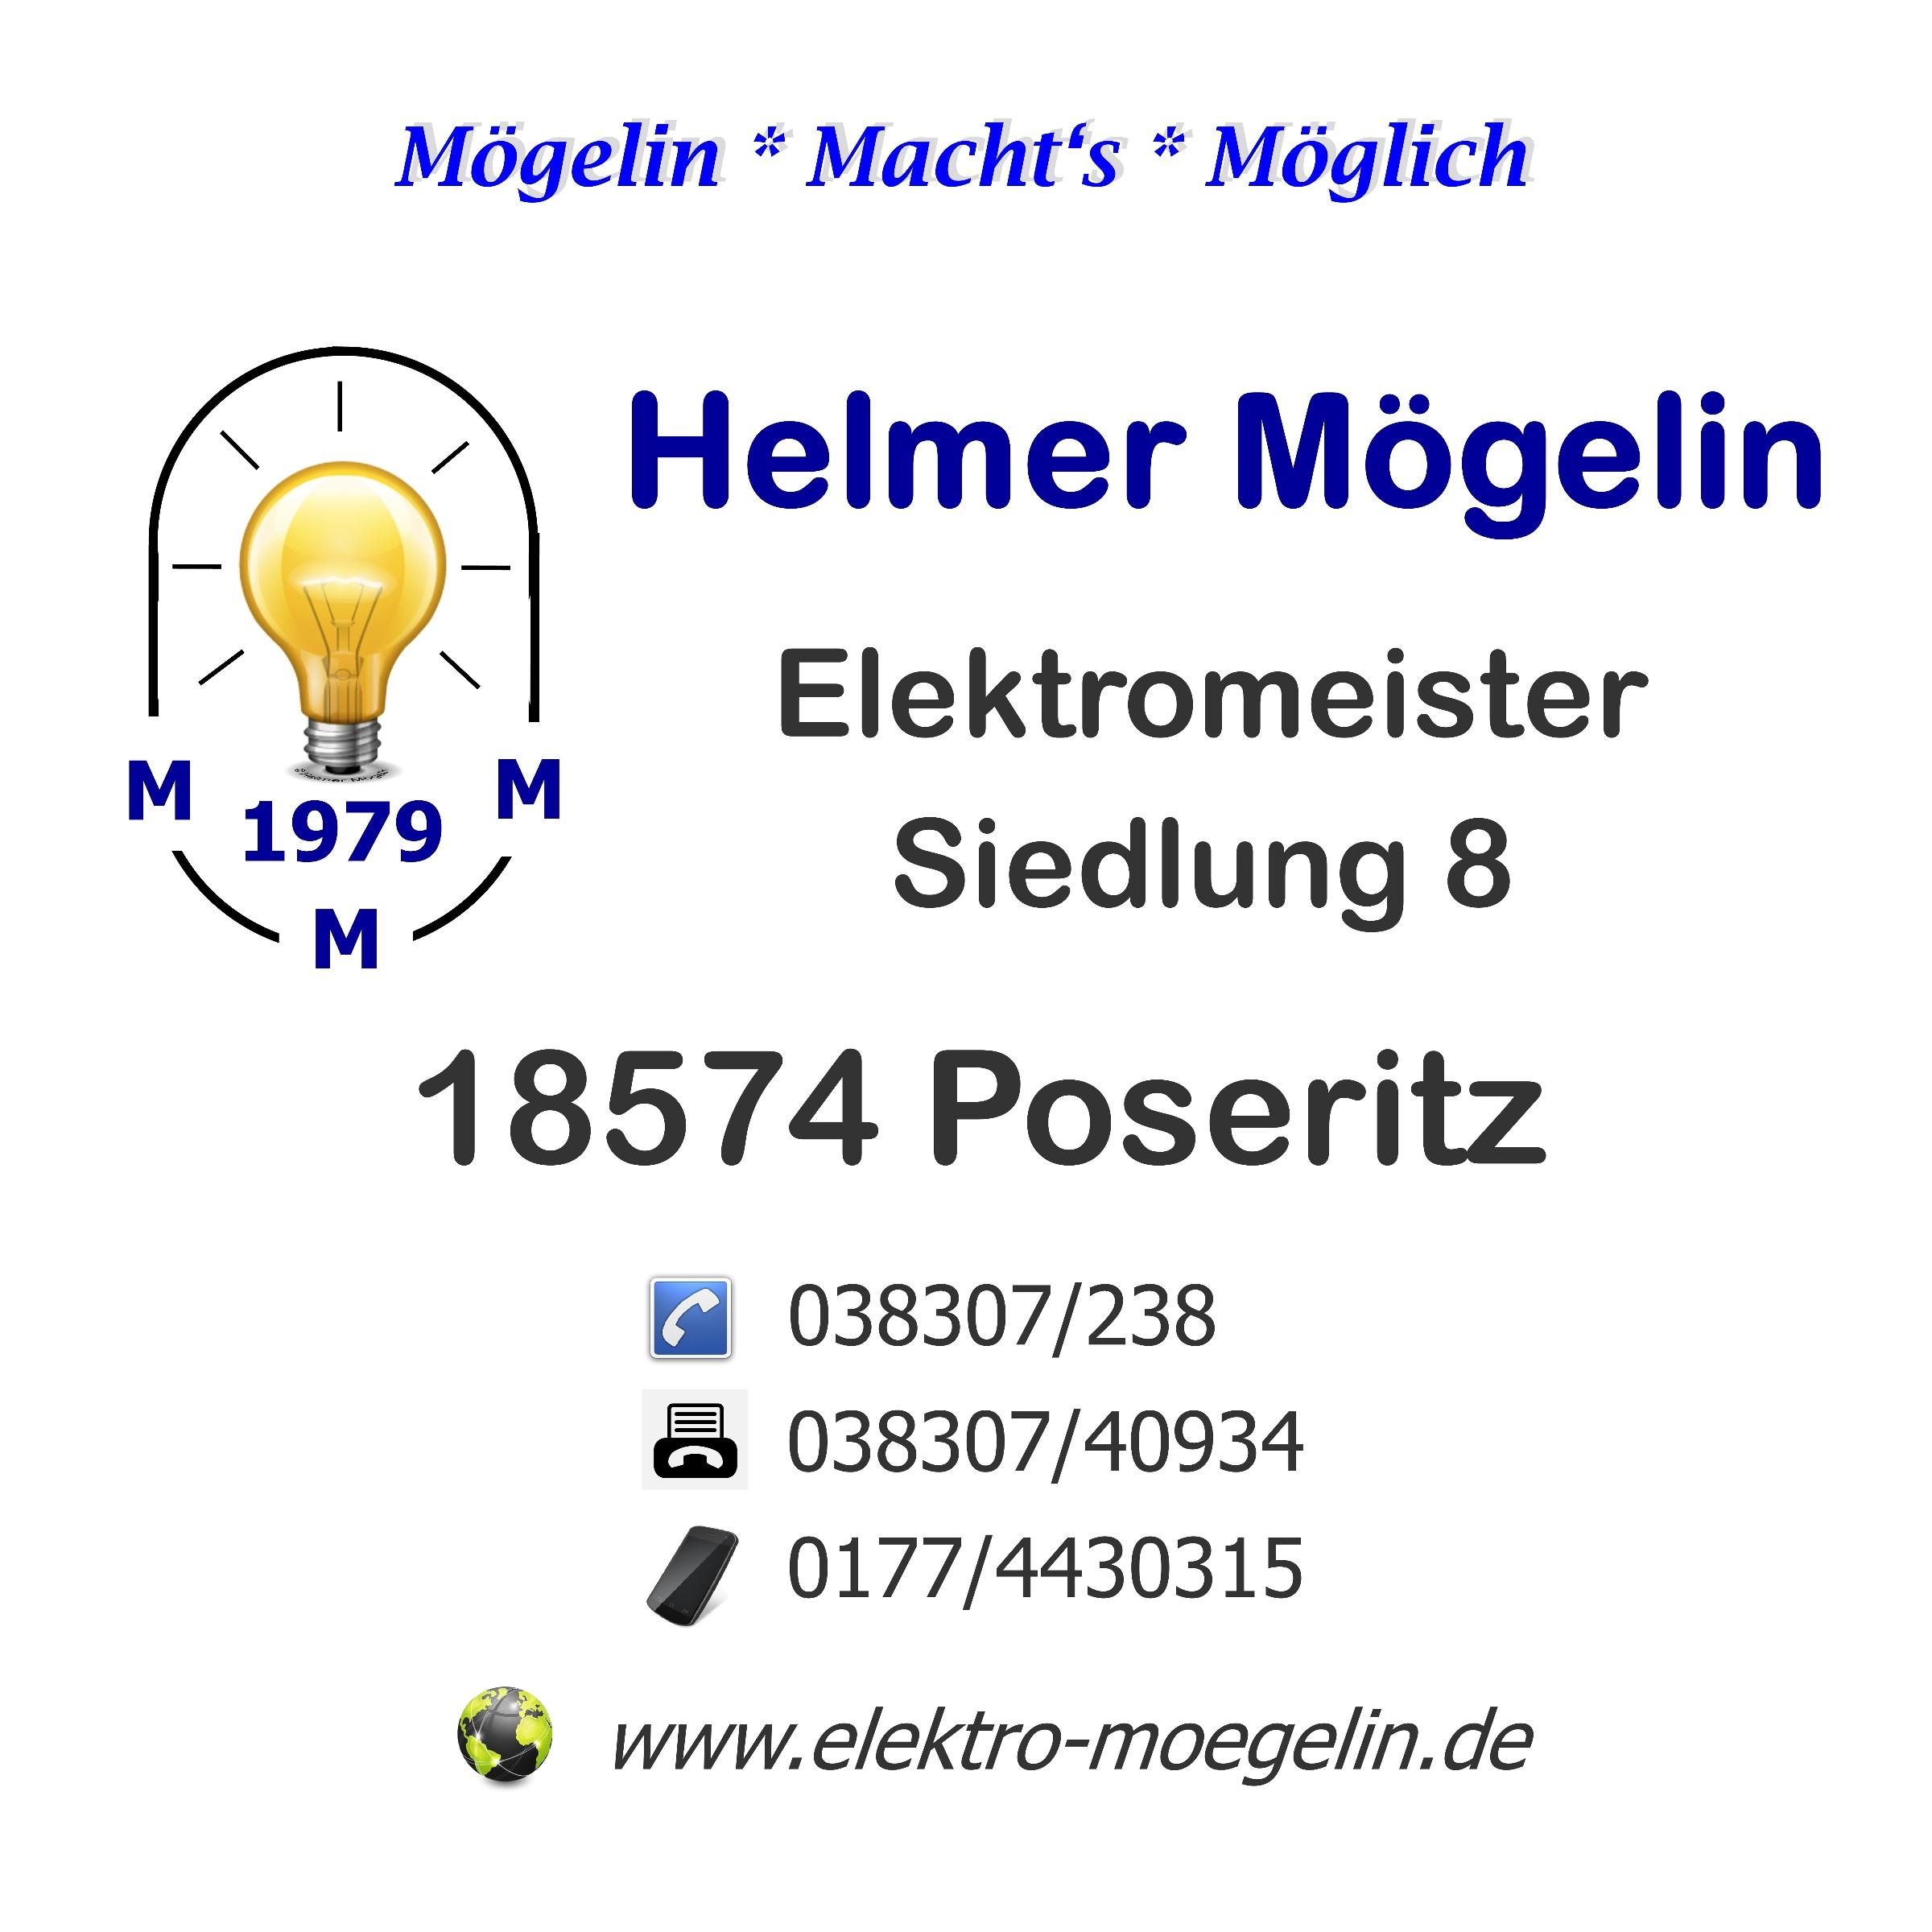 Helmer Mögelin Elektromeister